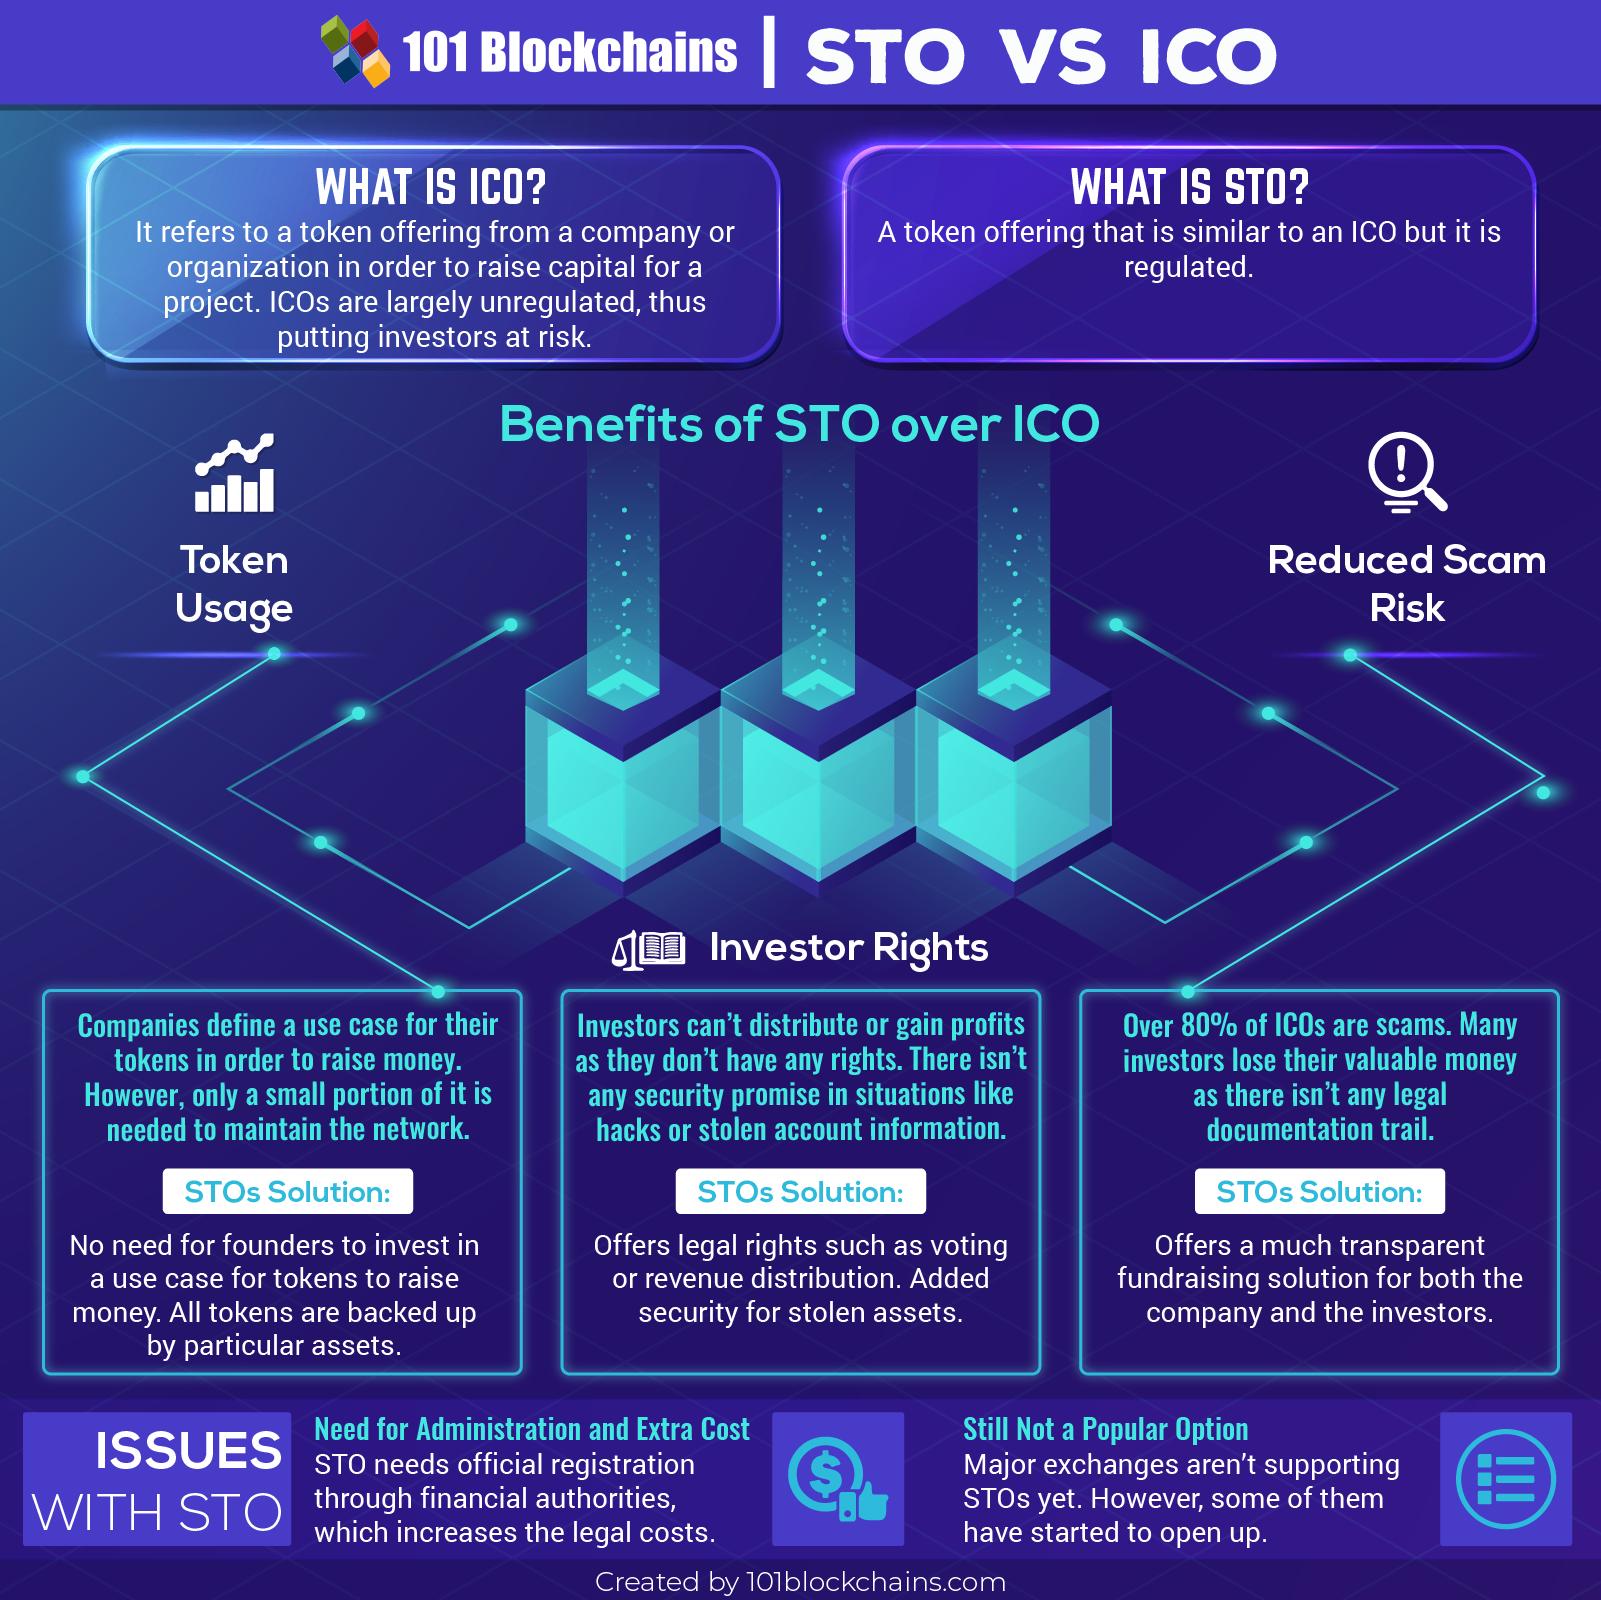 sto-ico-traderviet3.